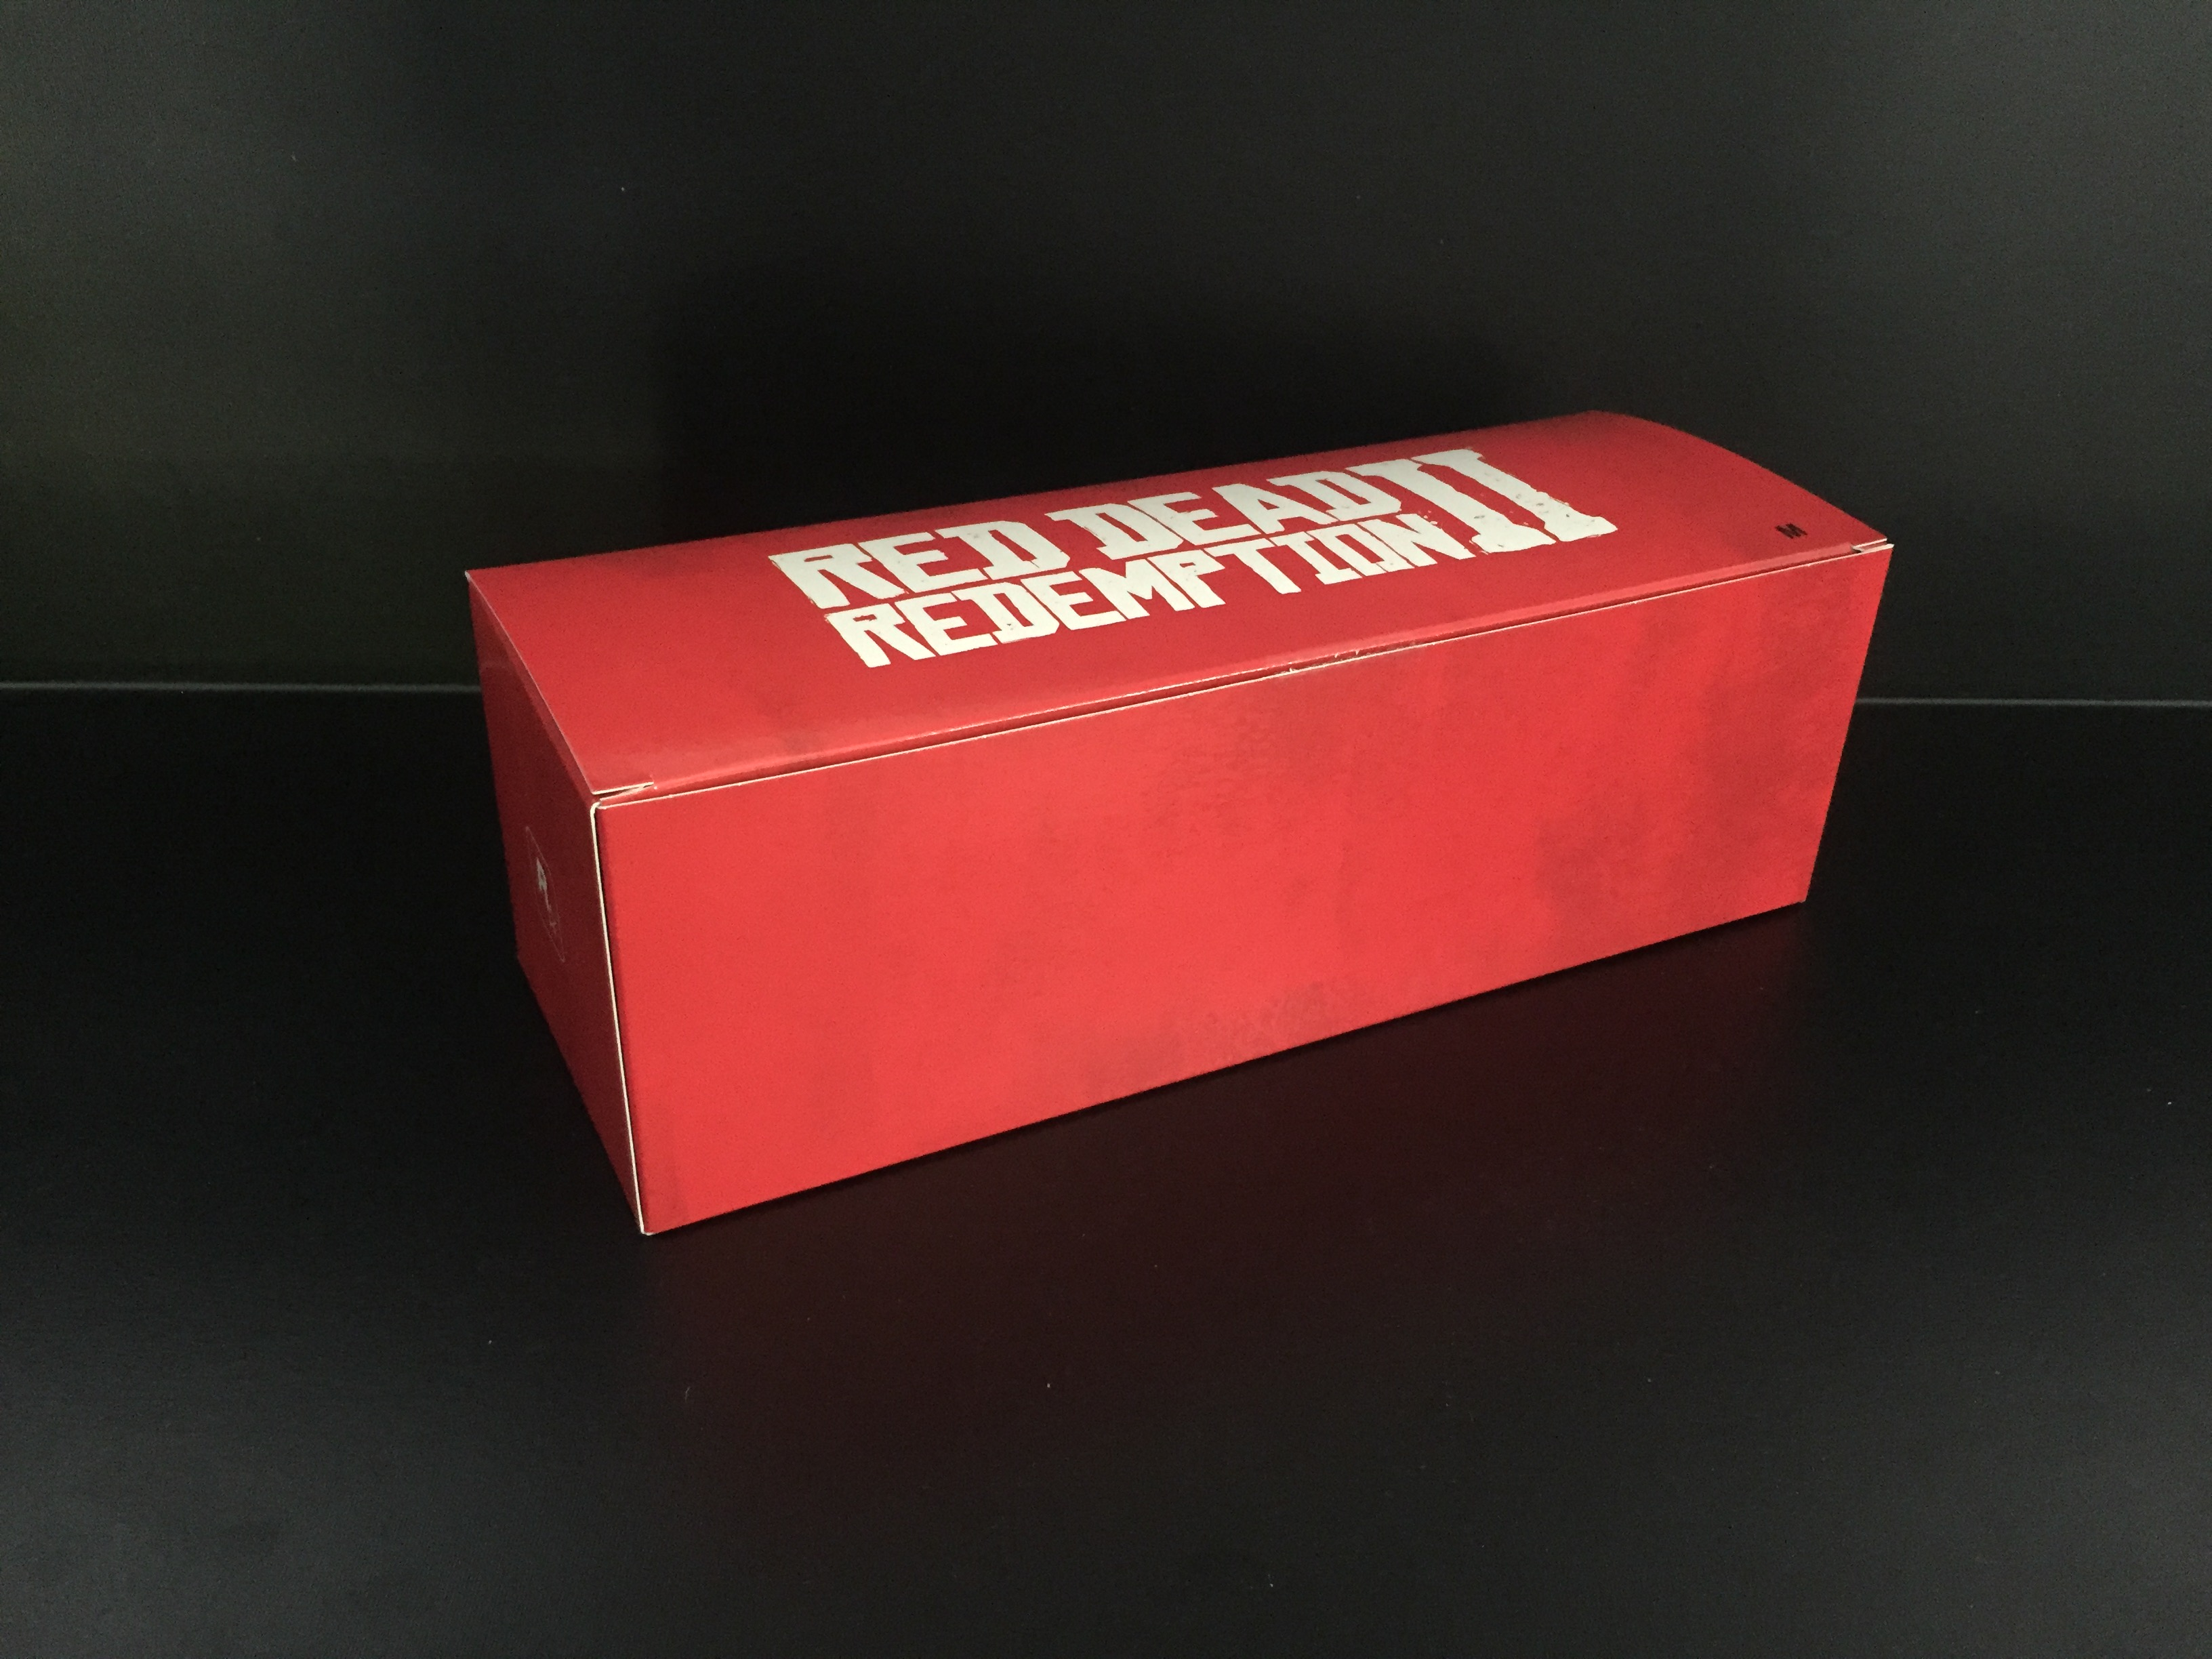 Colis Rockstar Games - Red Dead Redemption II - boîte